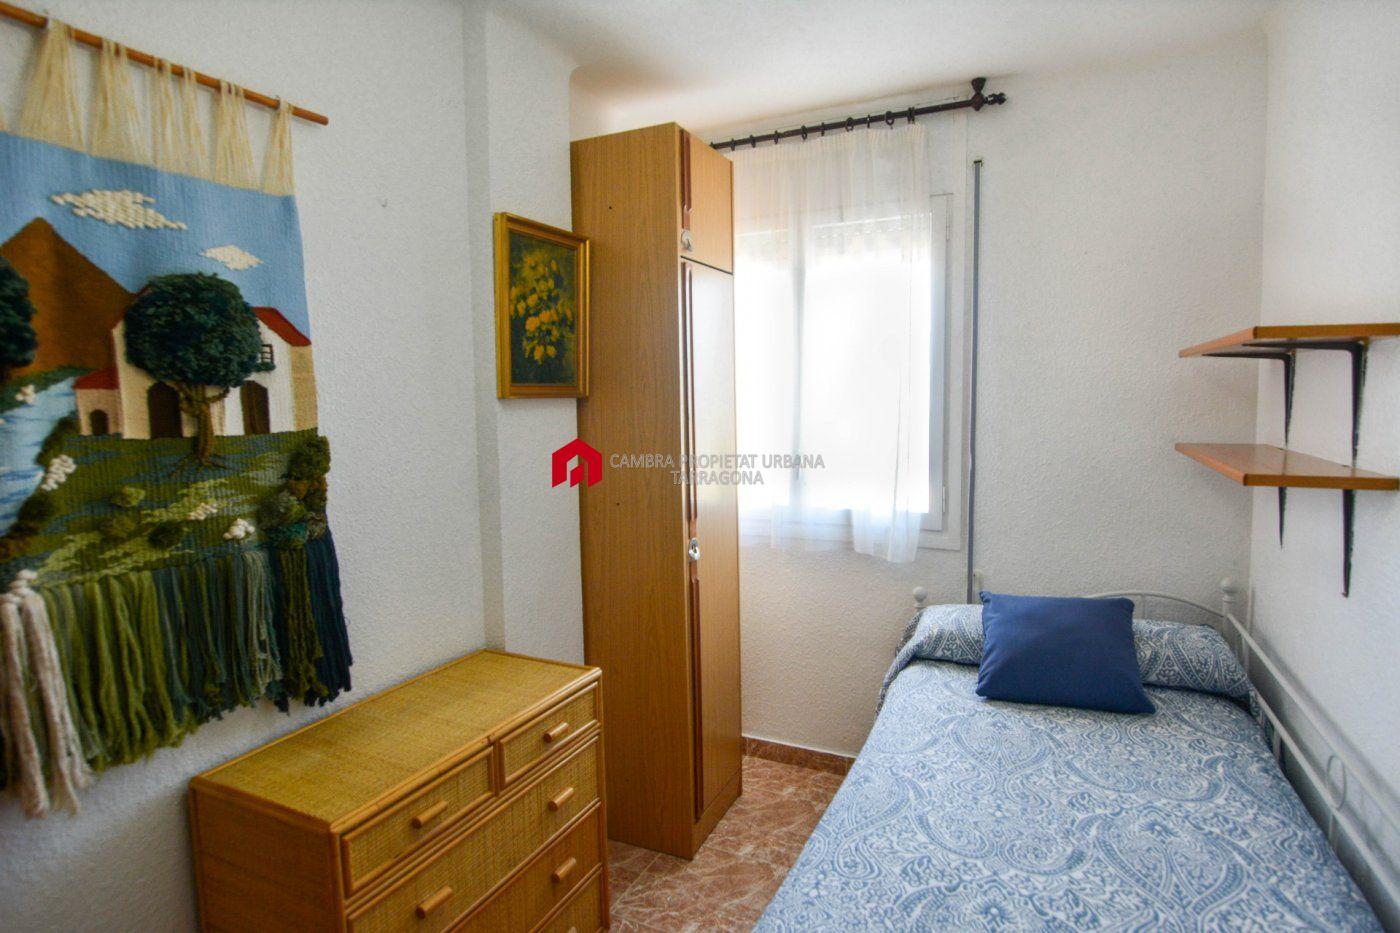 Pis · Tarragona · San Pedro Y San Pablo 555€ MES€